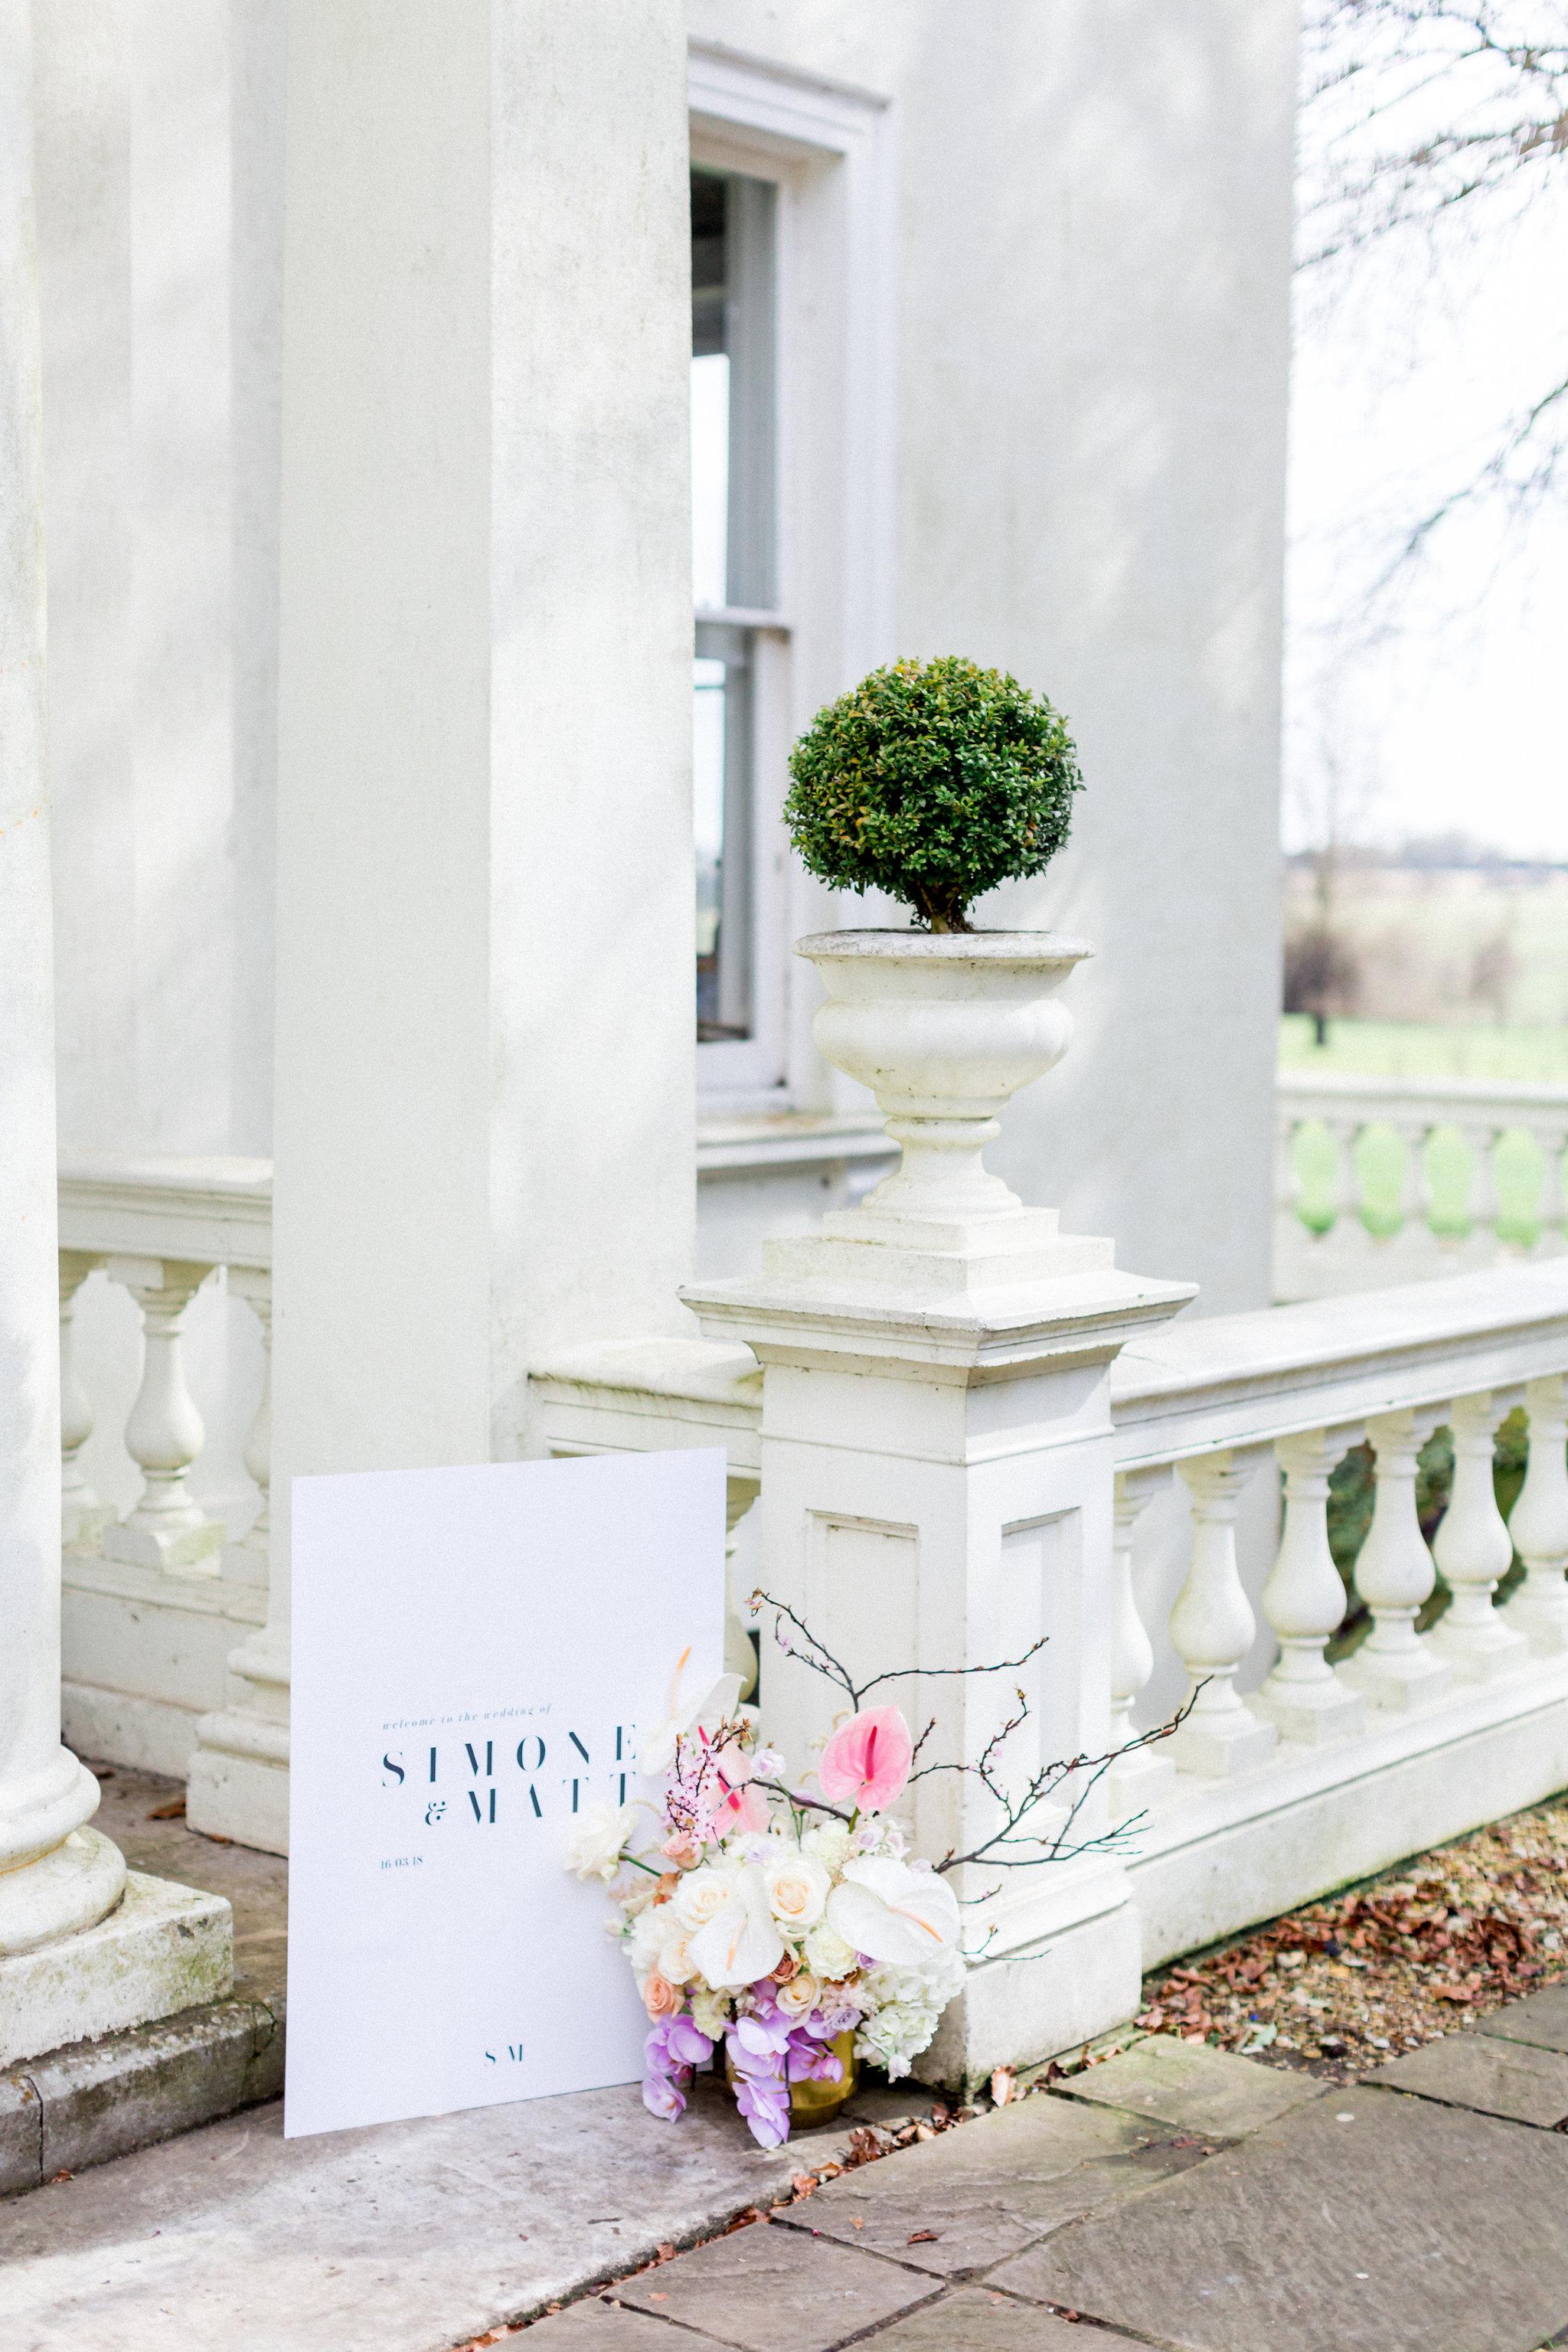 aleeka-events-wedding-planner-stylist-london-uk